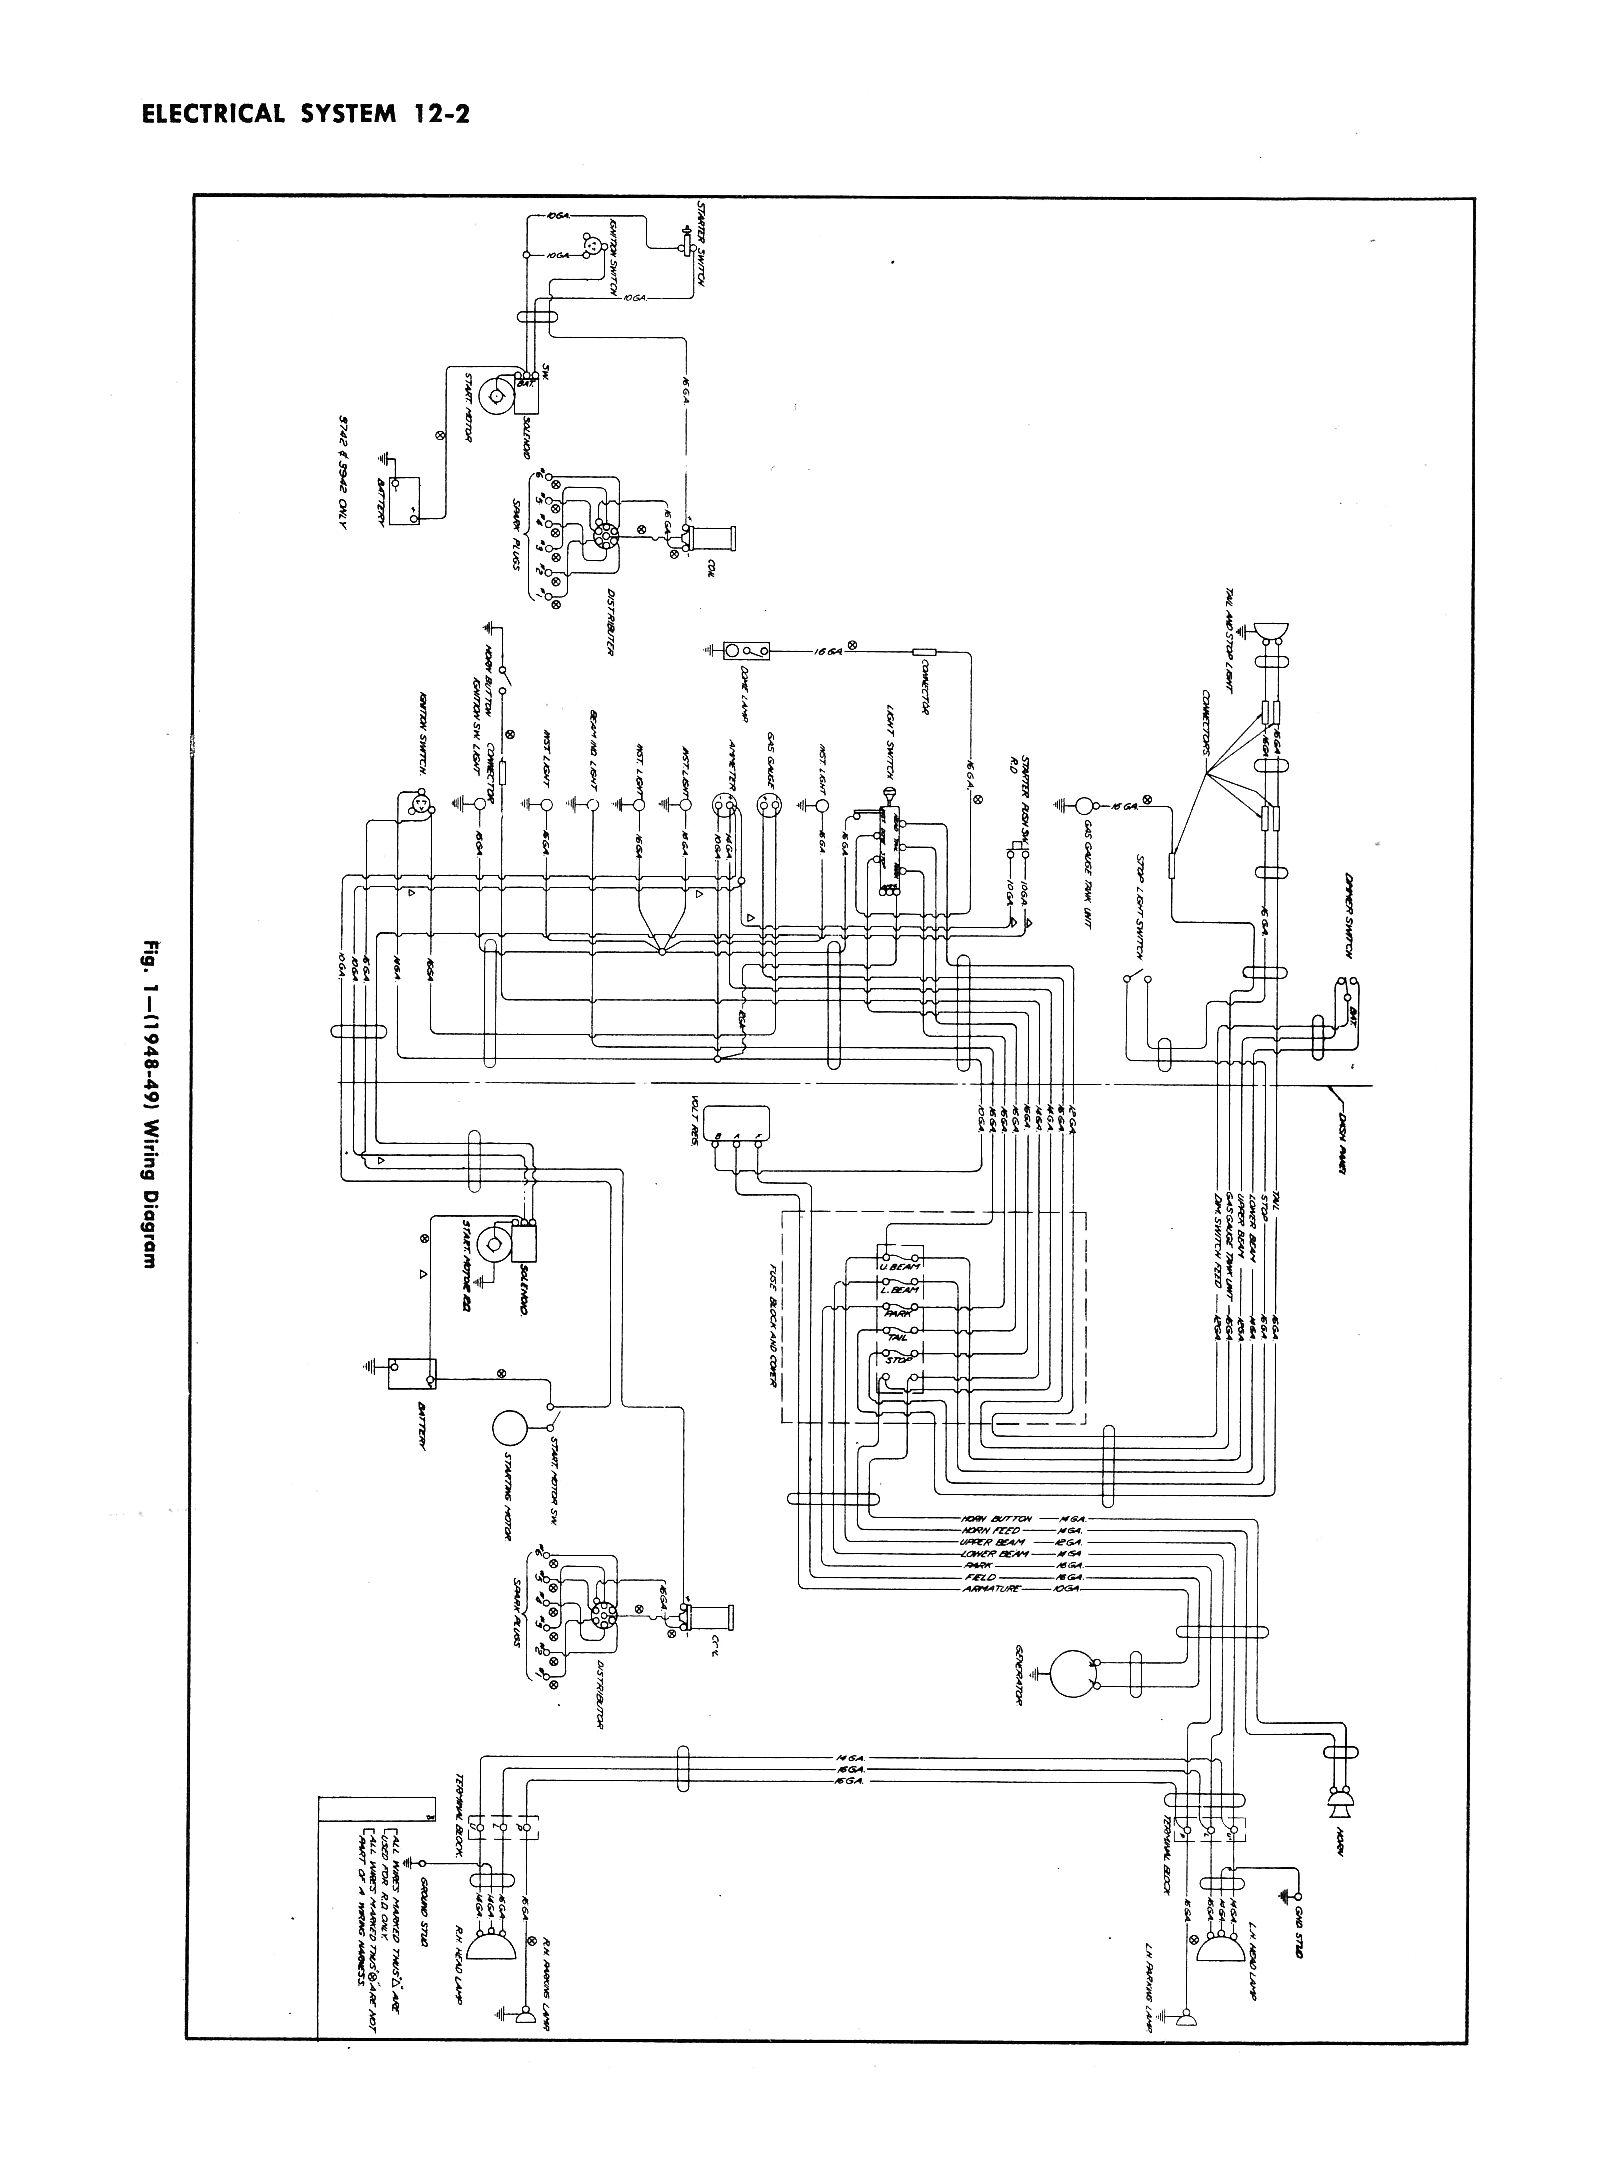 Va 7270 Cigar Lighter Wiring Diagram For 1954 Studebaker Champion And Commander Schematic Wiring